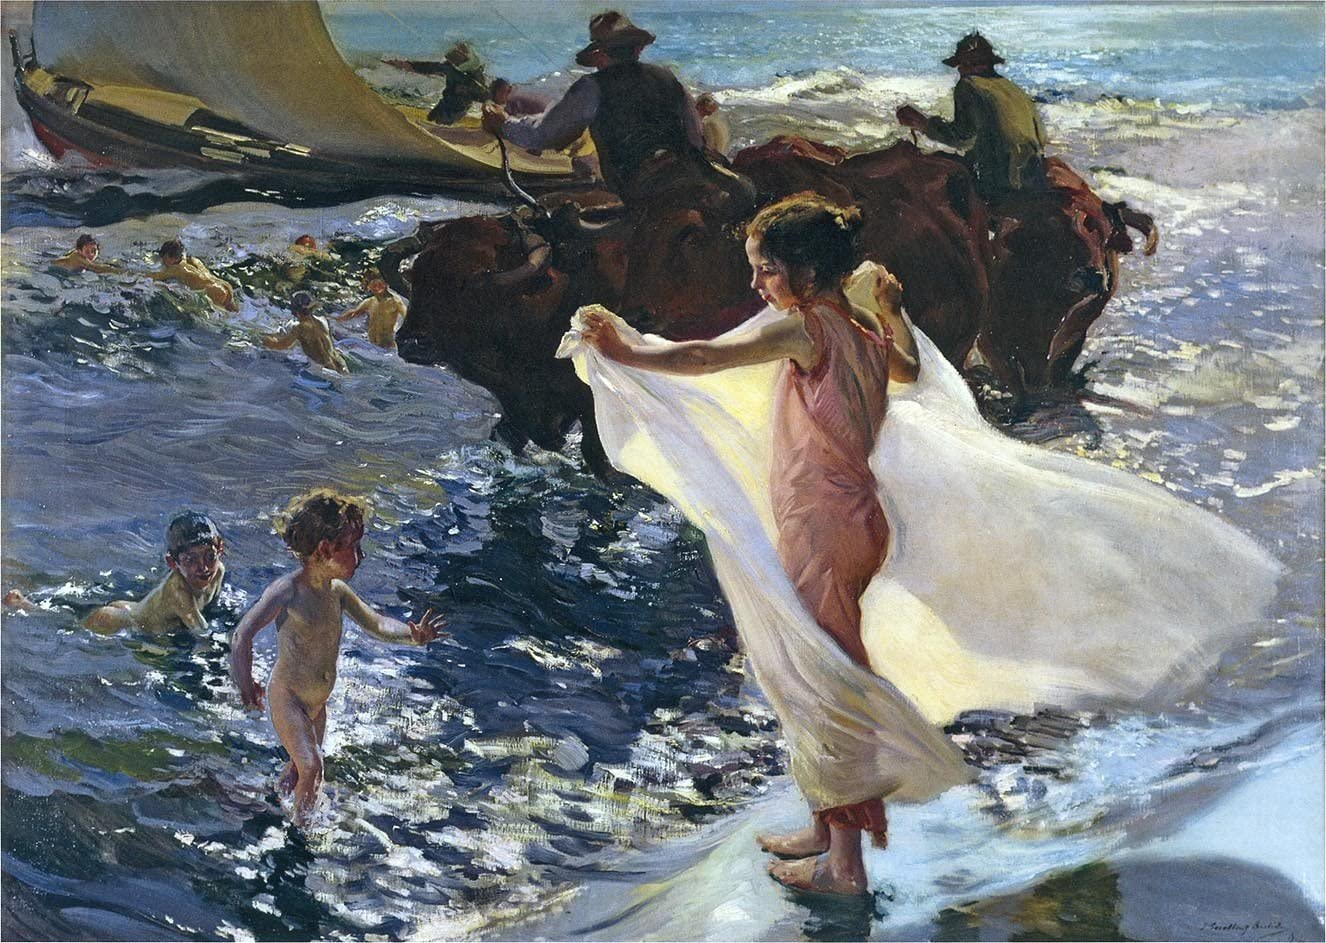 ODSAN Bathing Time - By Joaquin Sorolla Y Bastida - Impresión en lienzo 24x17 pulgadas - sin marco